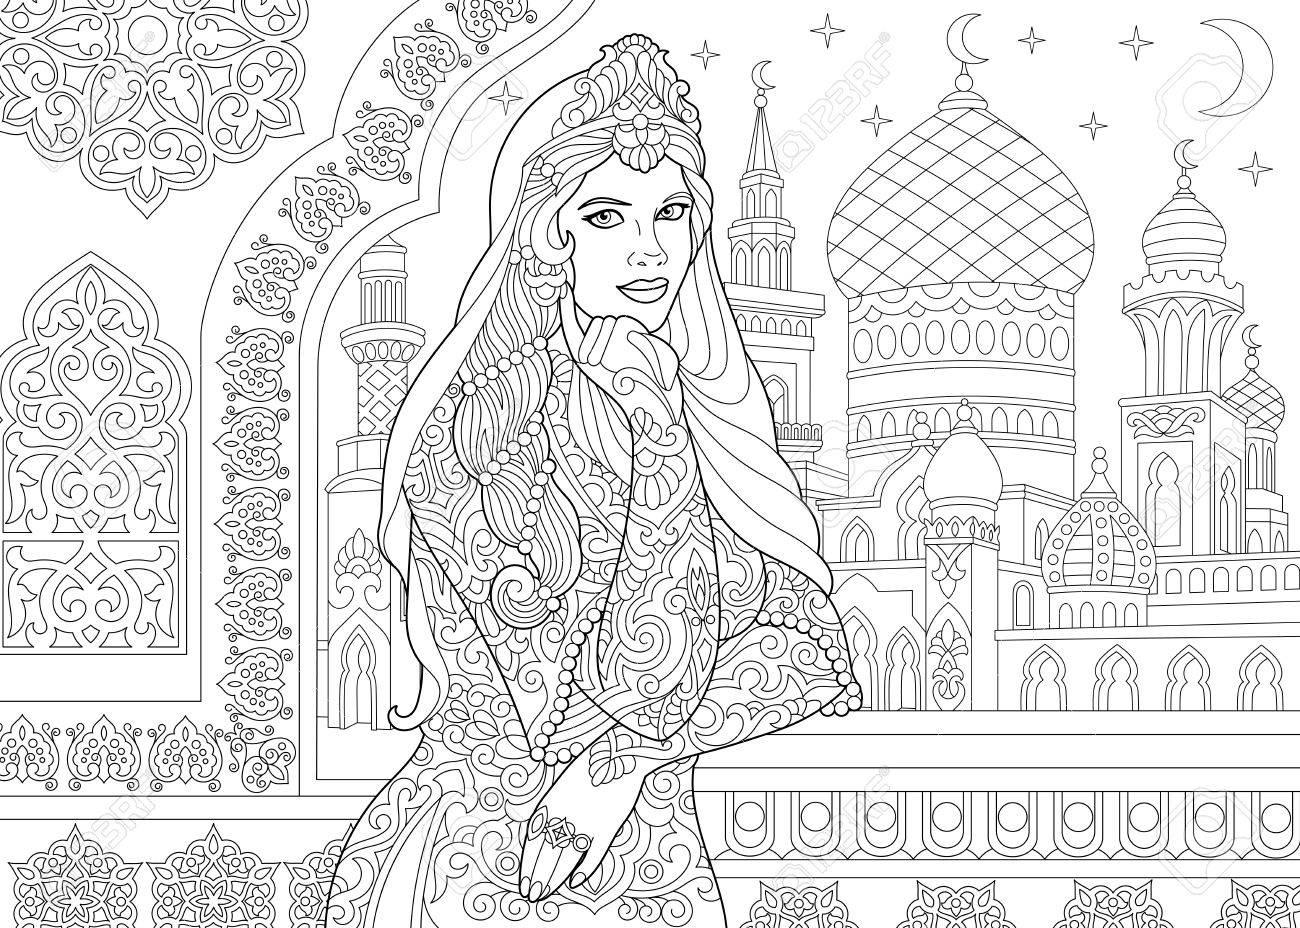 Coloriage De Femme Turque Decor De Filigrane Islamique Mosquee